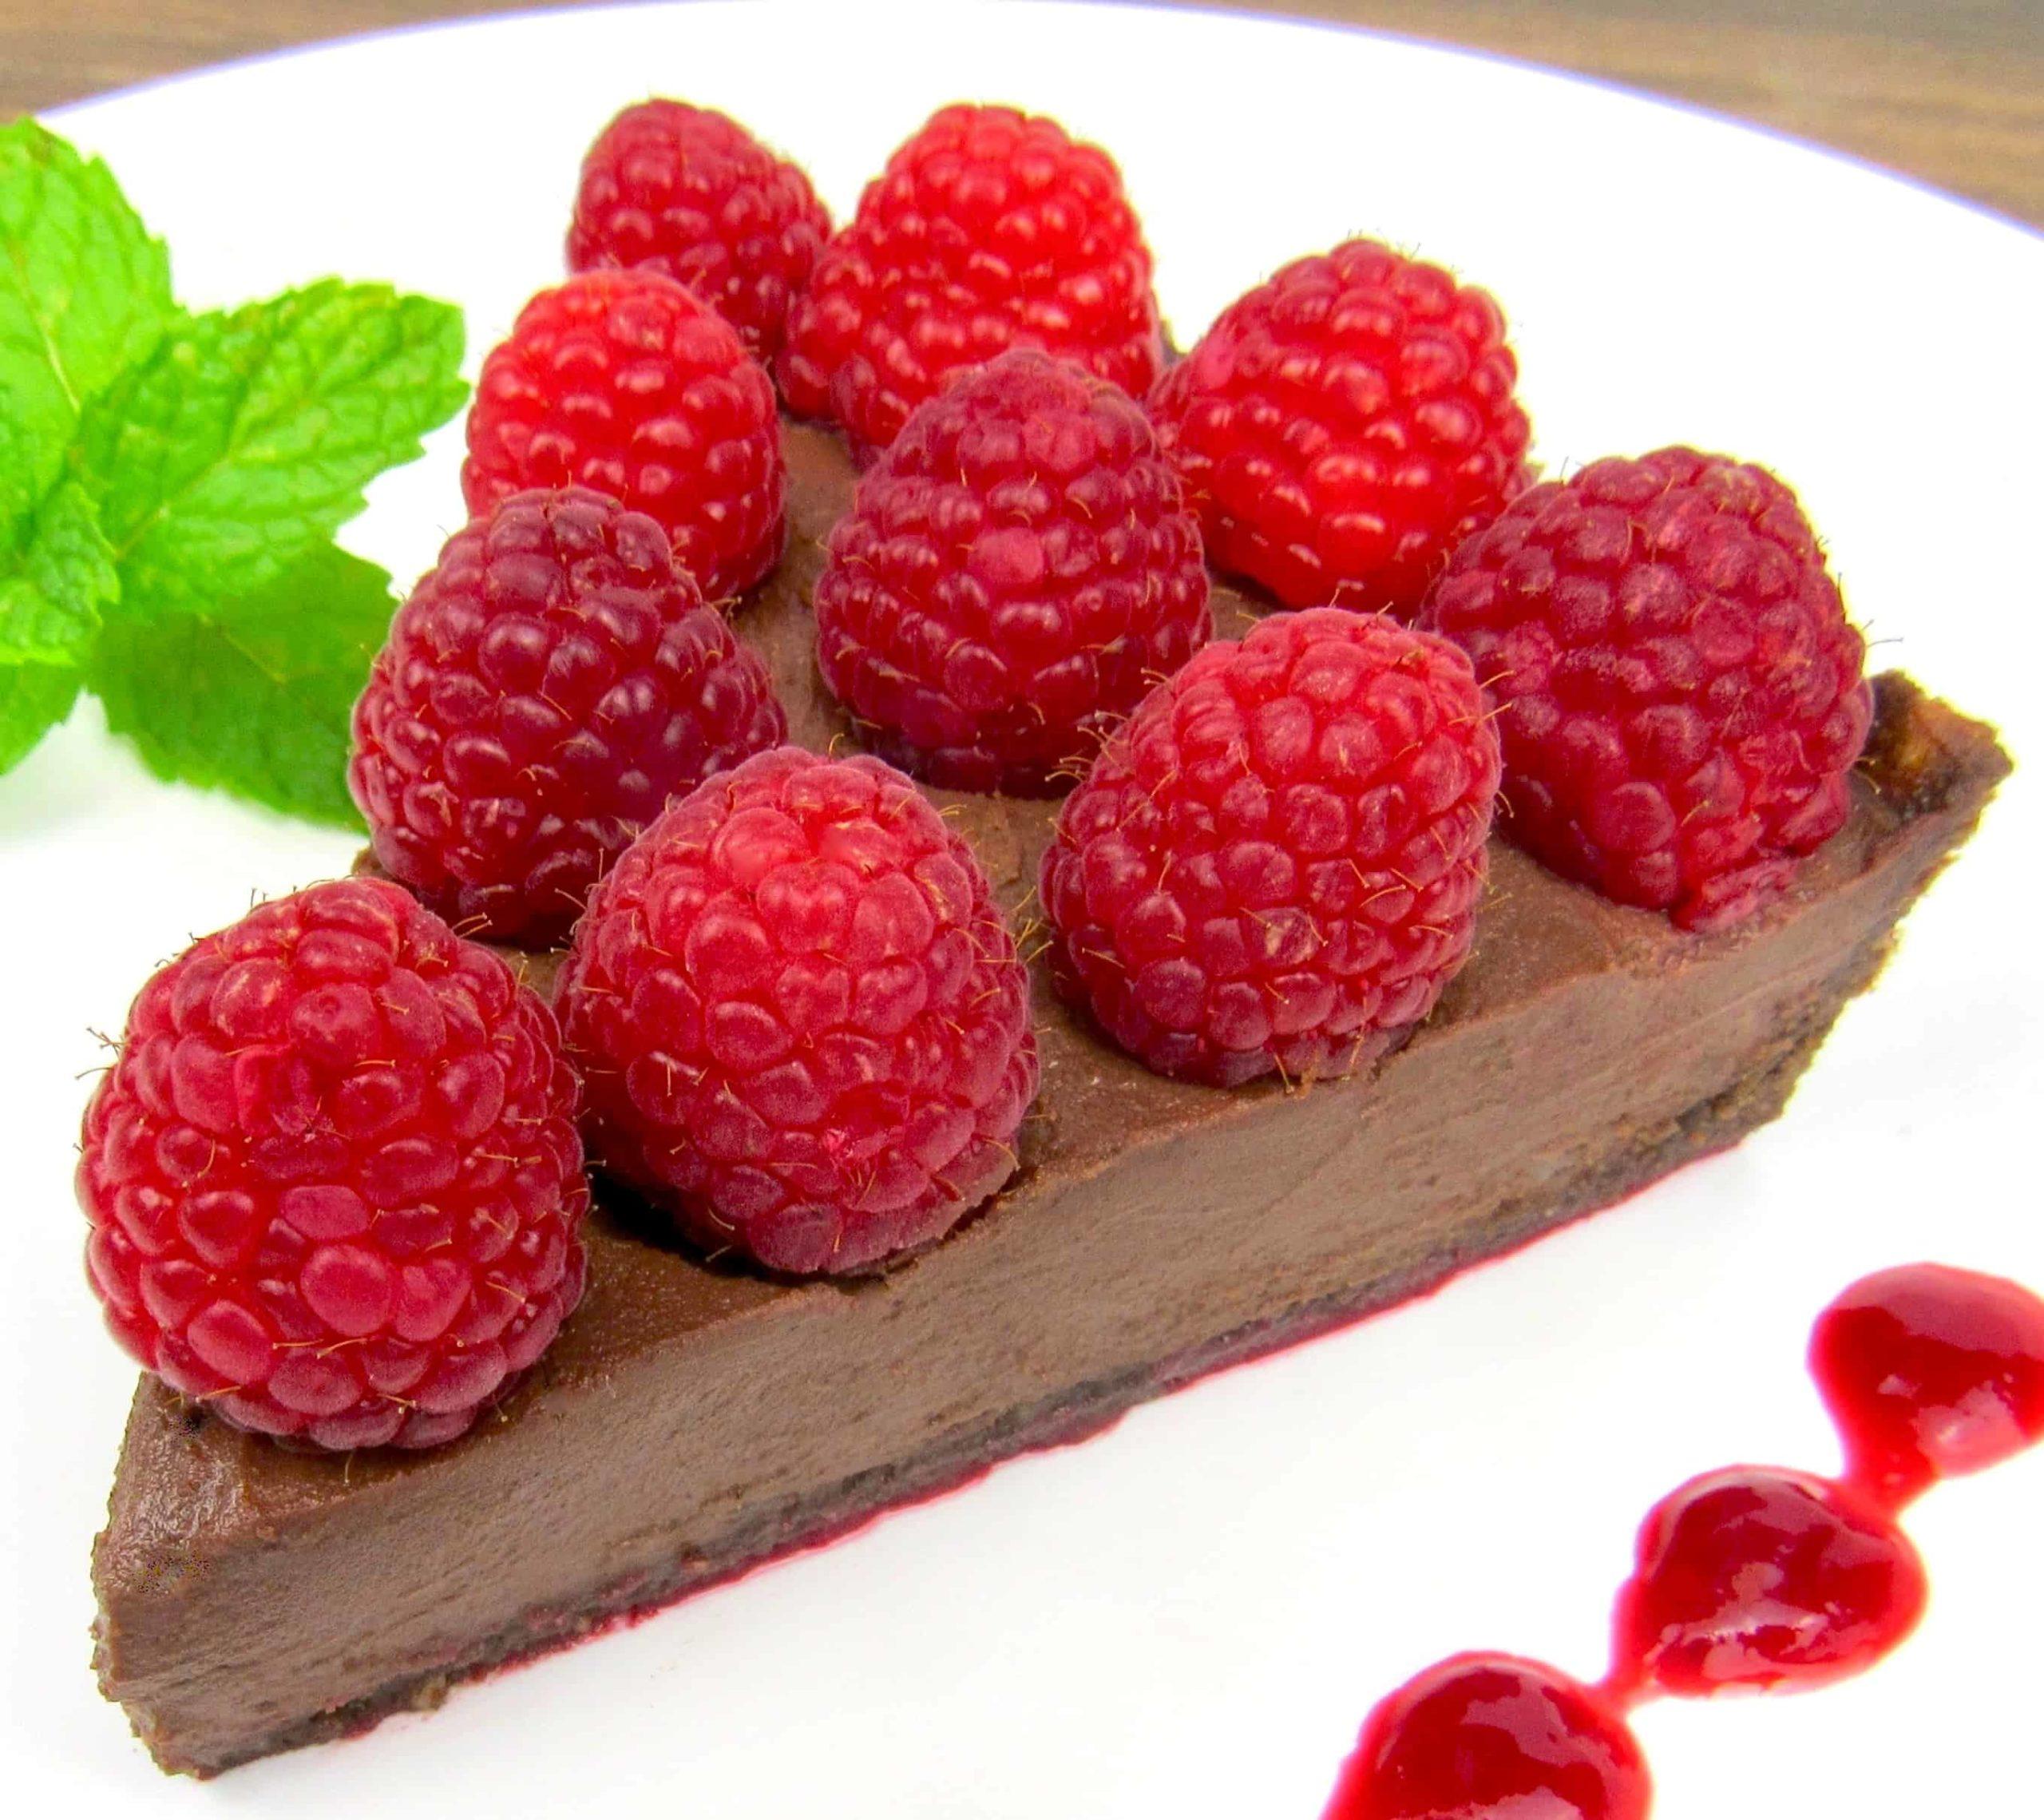 slice of chocolate tart with raspberries on top